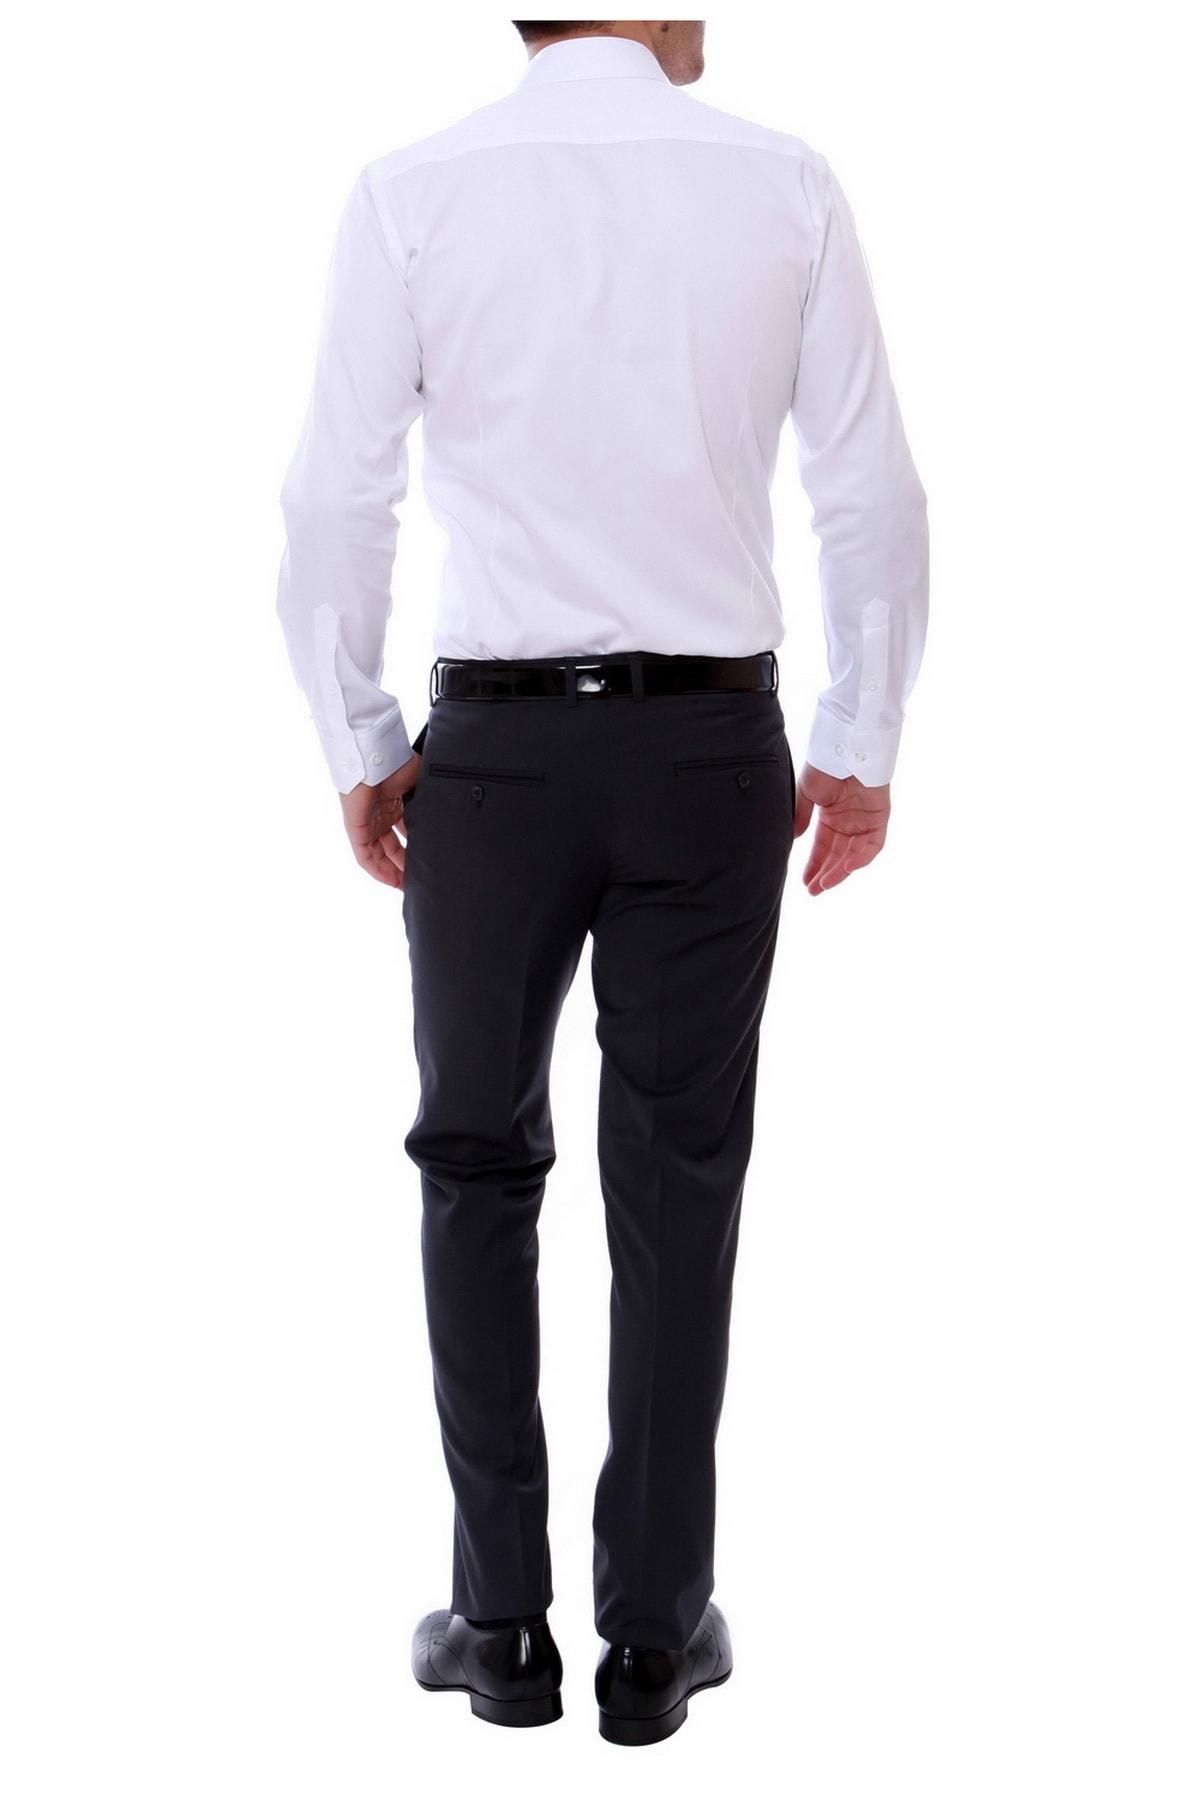 Efor P 888 Slim Fit Antrasit Klasik Pantolon 2